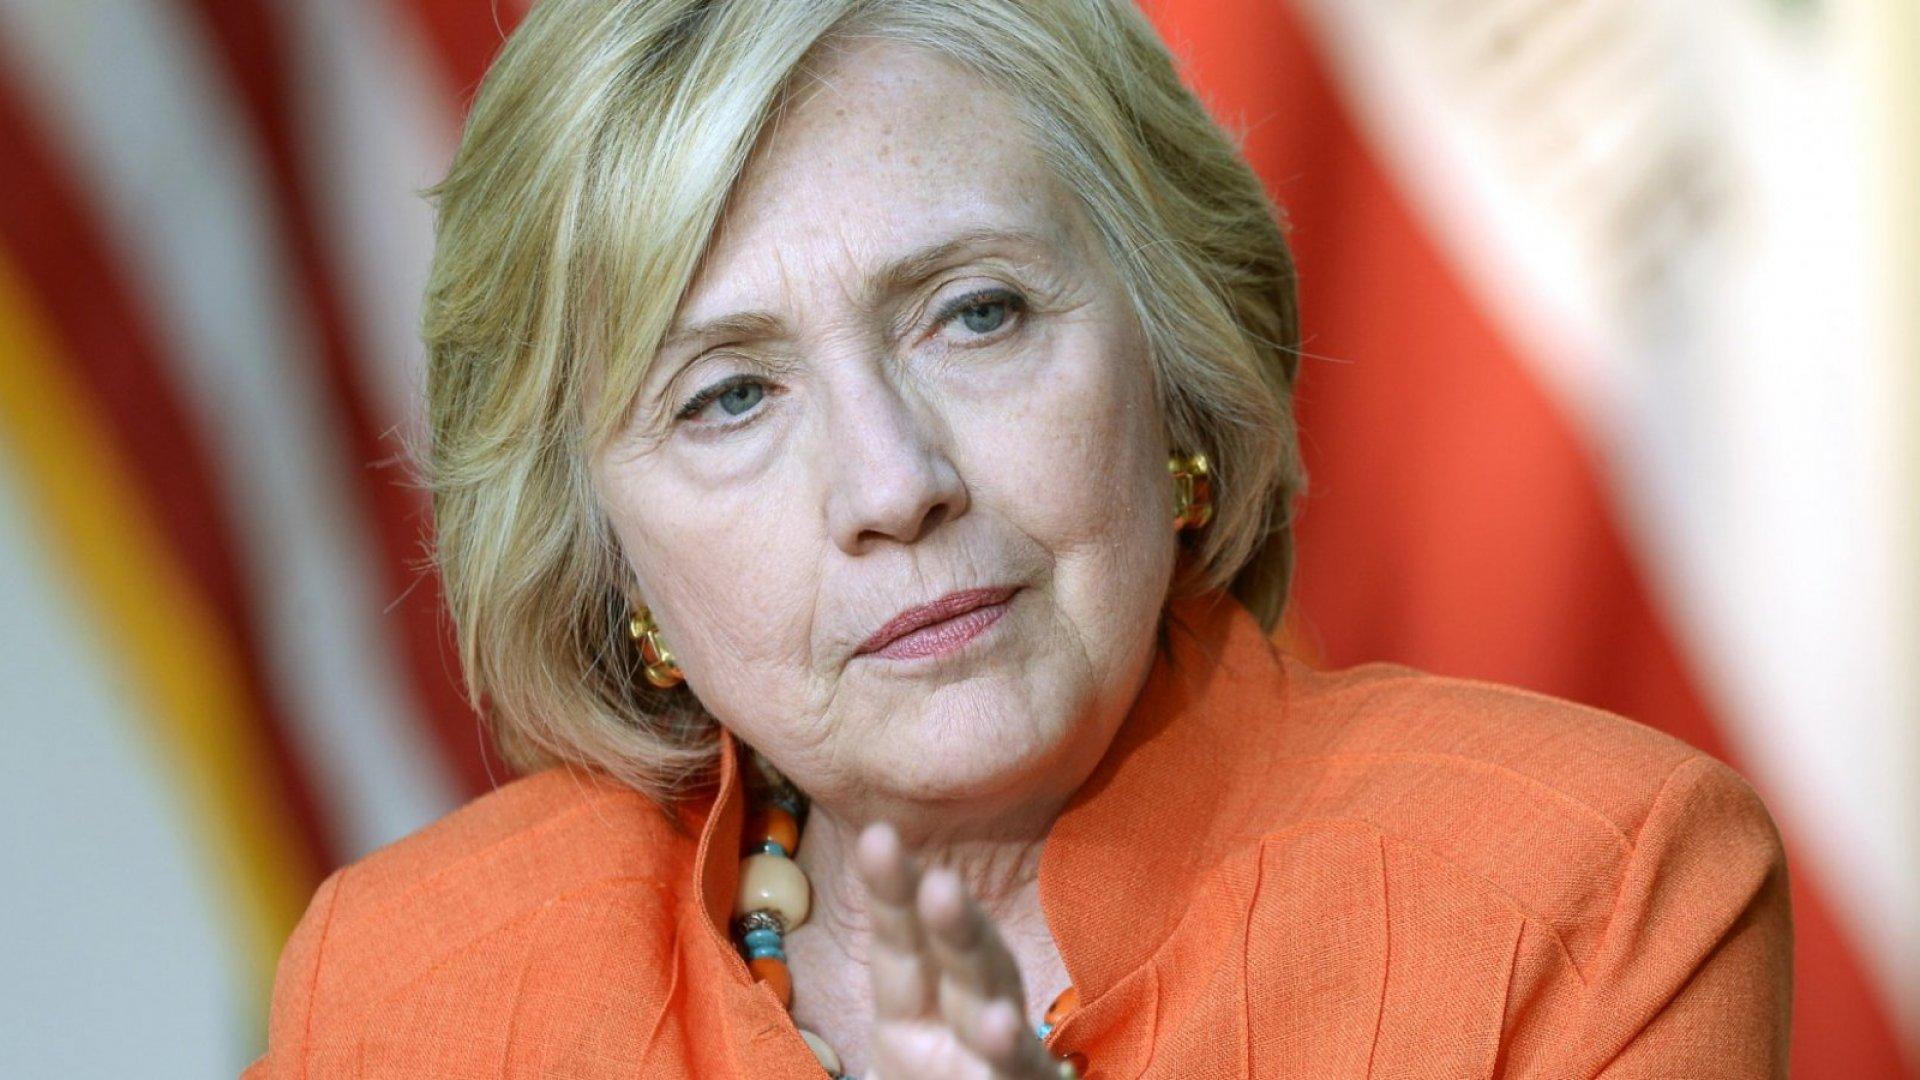 Clinton to Propose $350 Billion College Affordability Plan